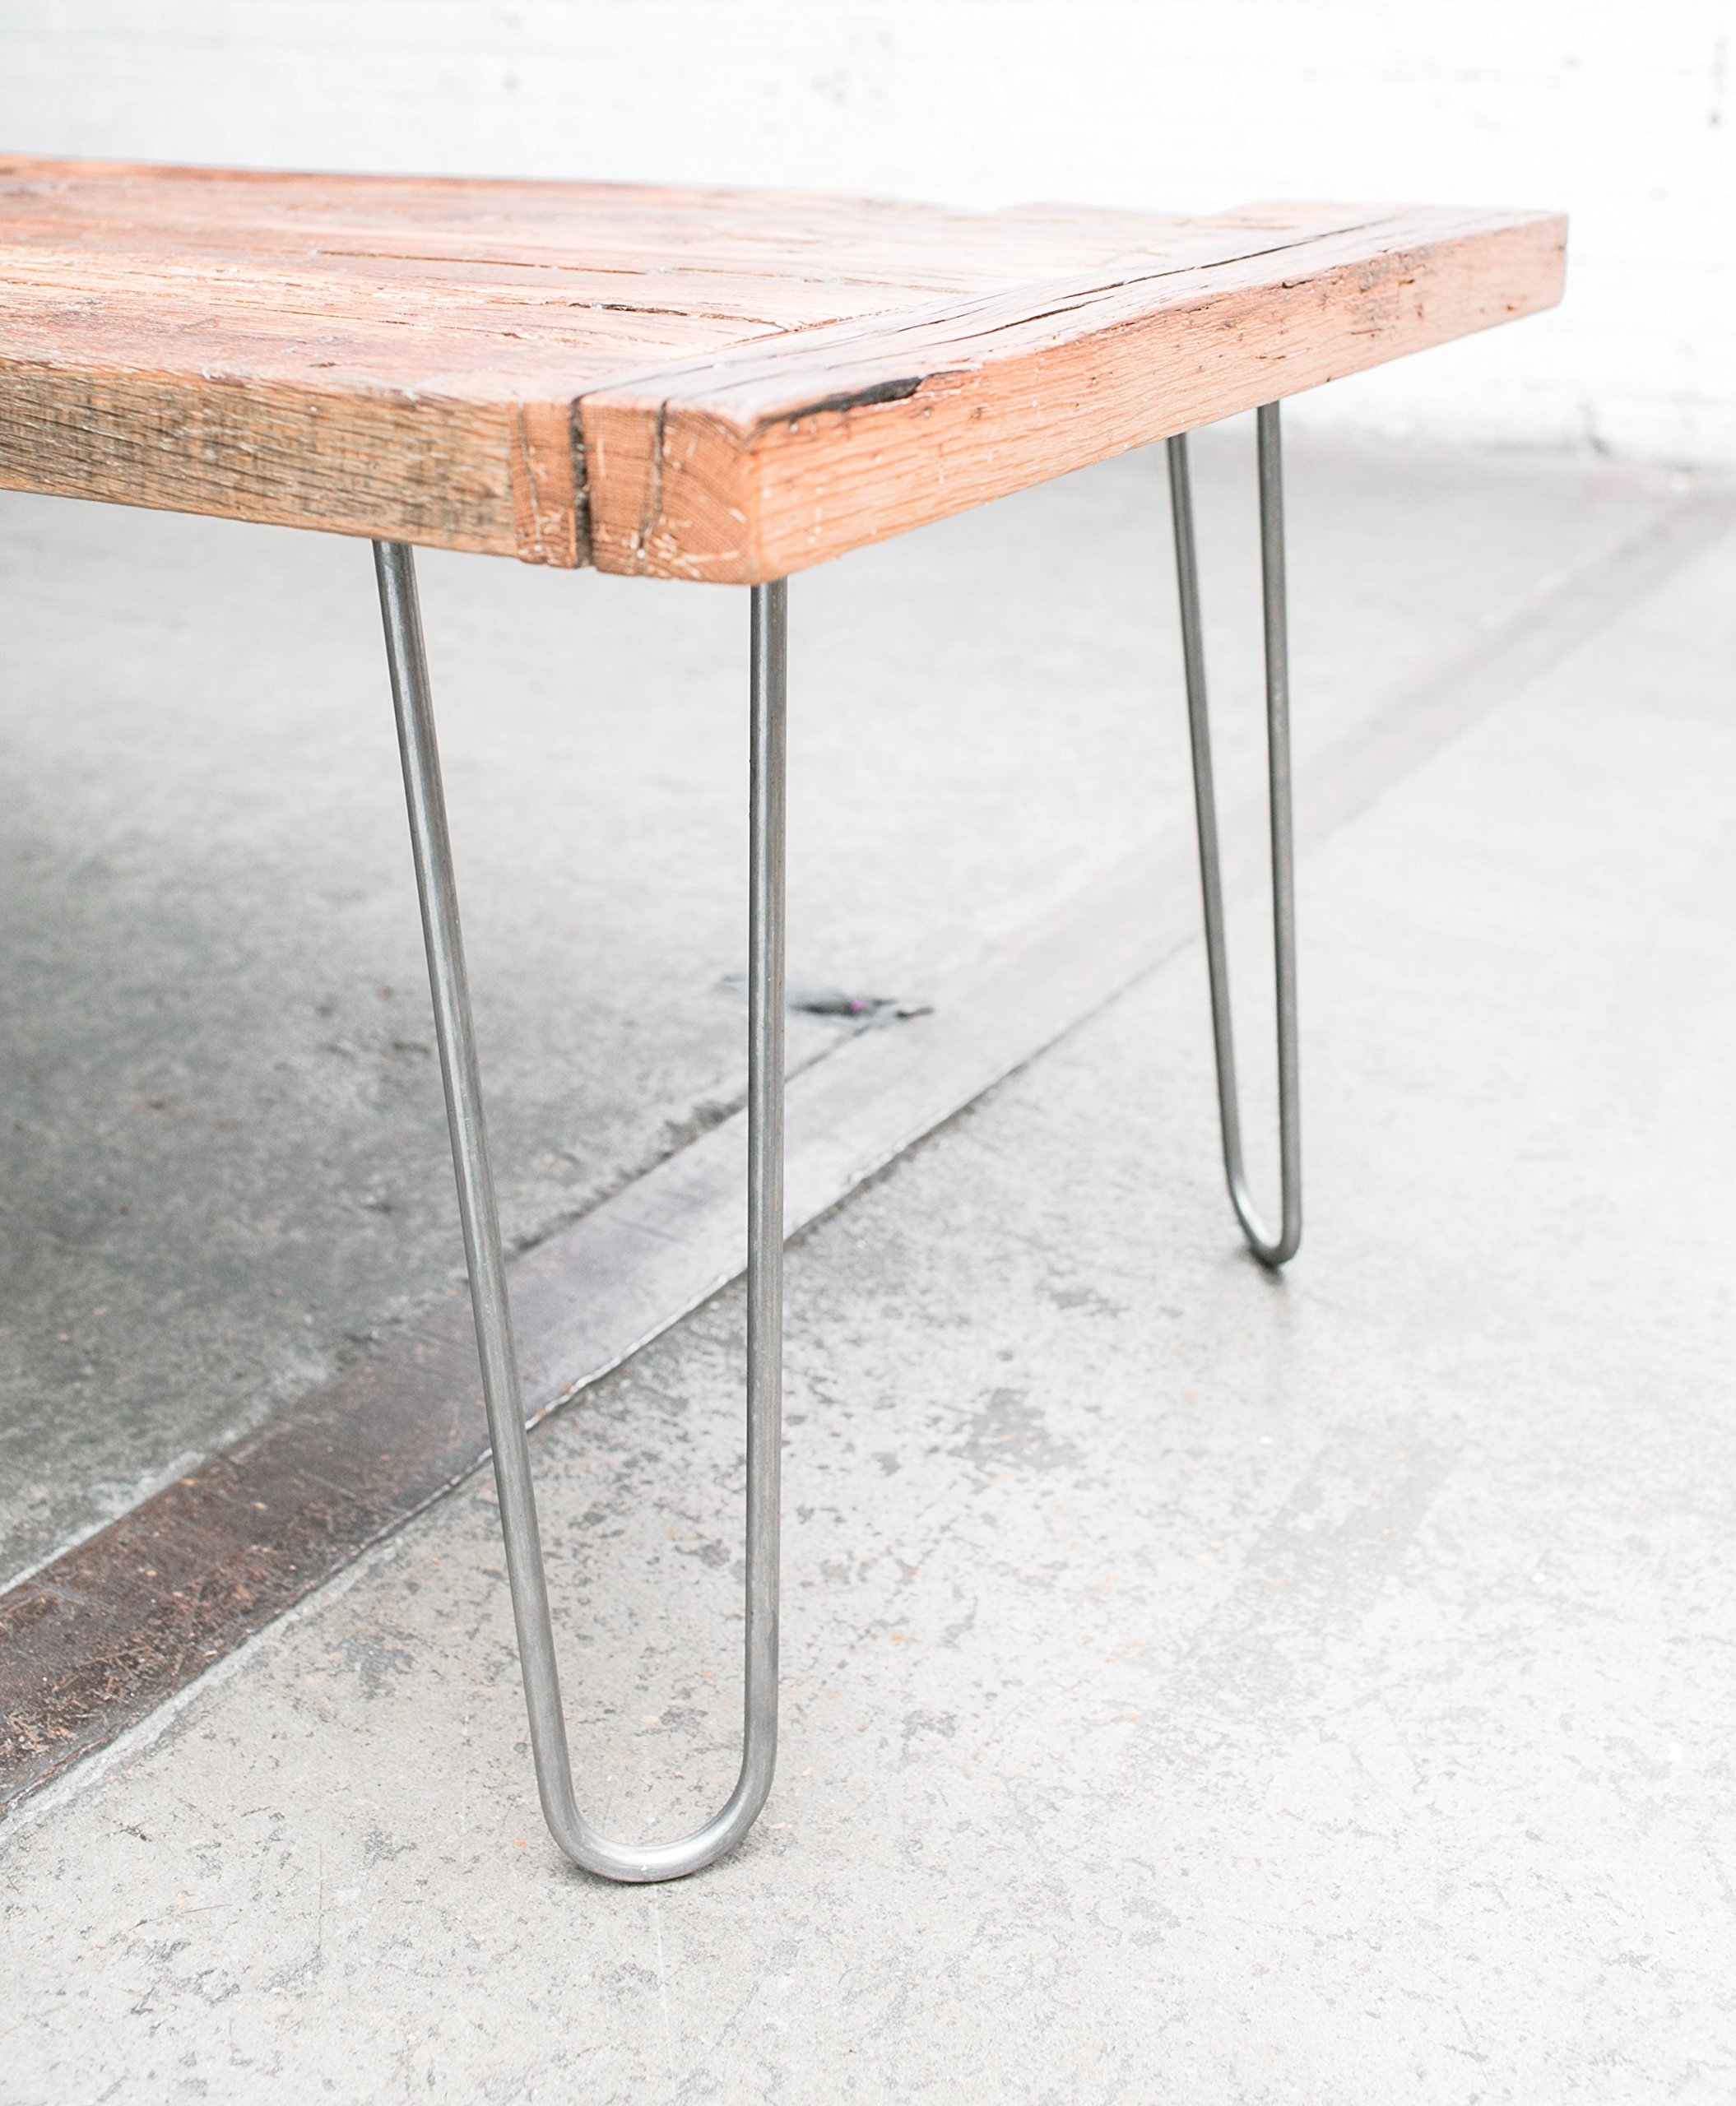 16'' Hairpin Legs (Raw Steel) ▫ Industrial Strength ▫ Mid Century Modern ▫ Set of 4 Table Legs